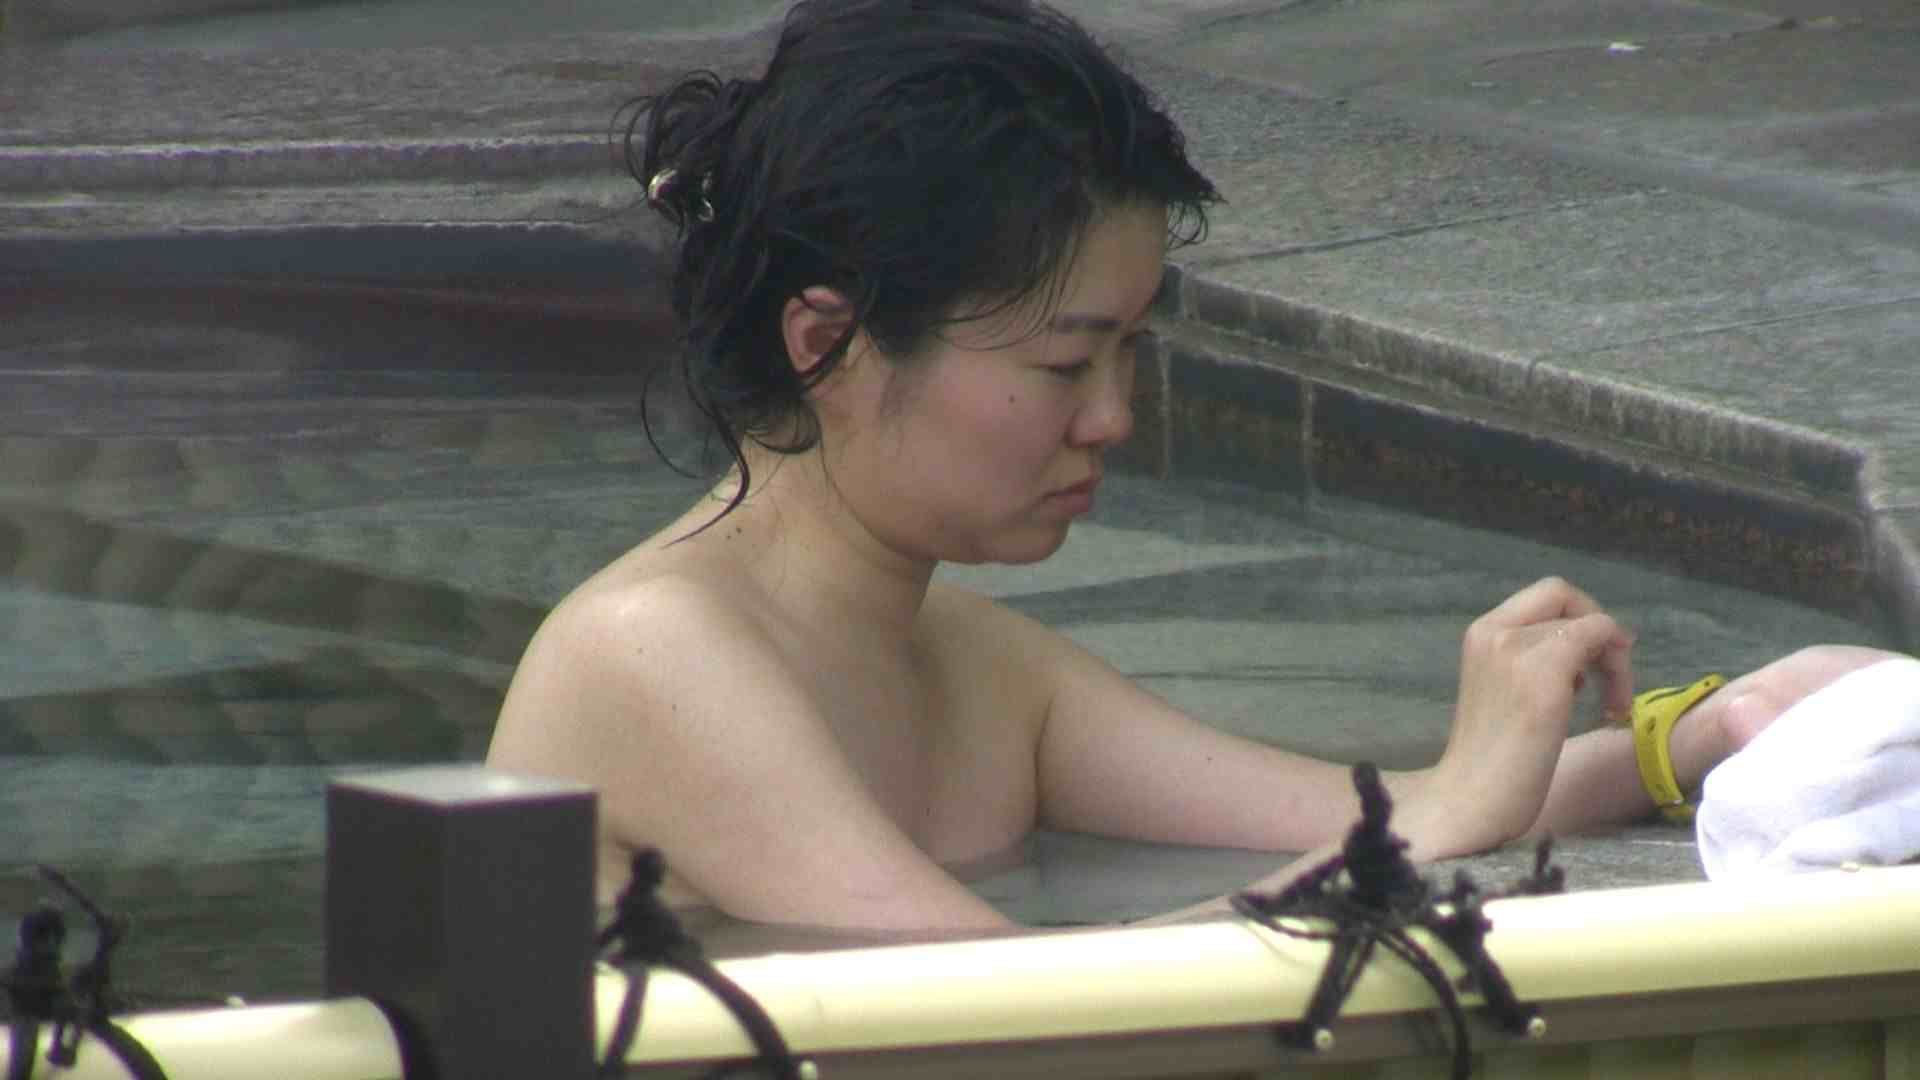 Aquaな露天風呂Vol.675 OLのプライベート  10pic 9